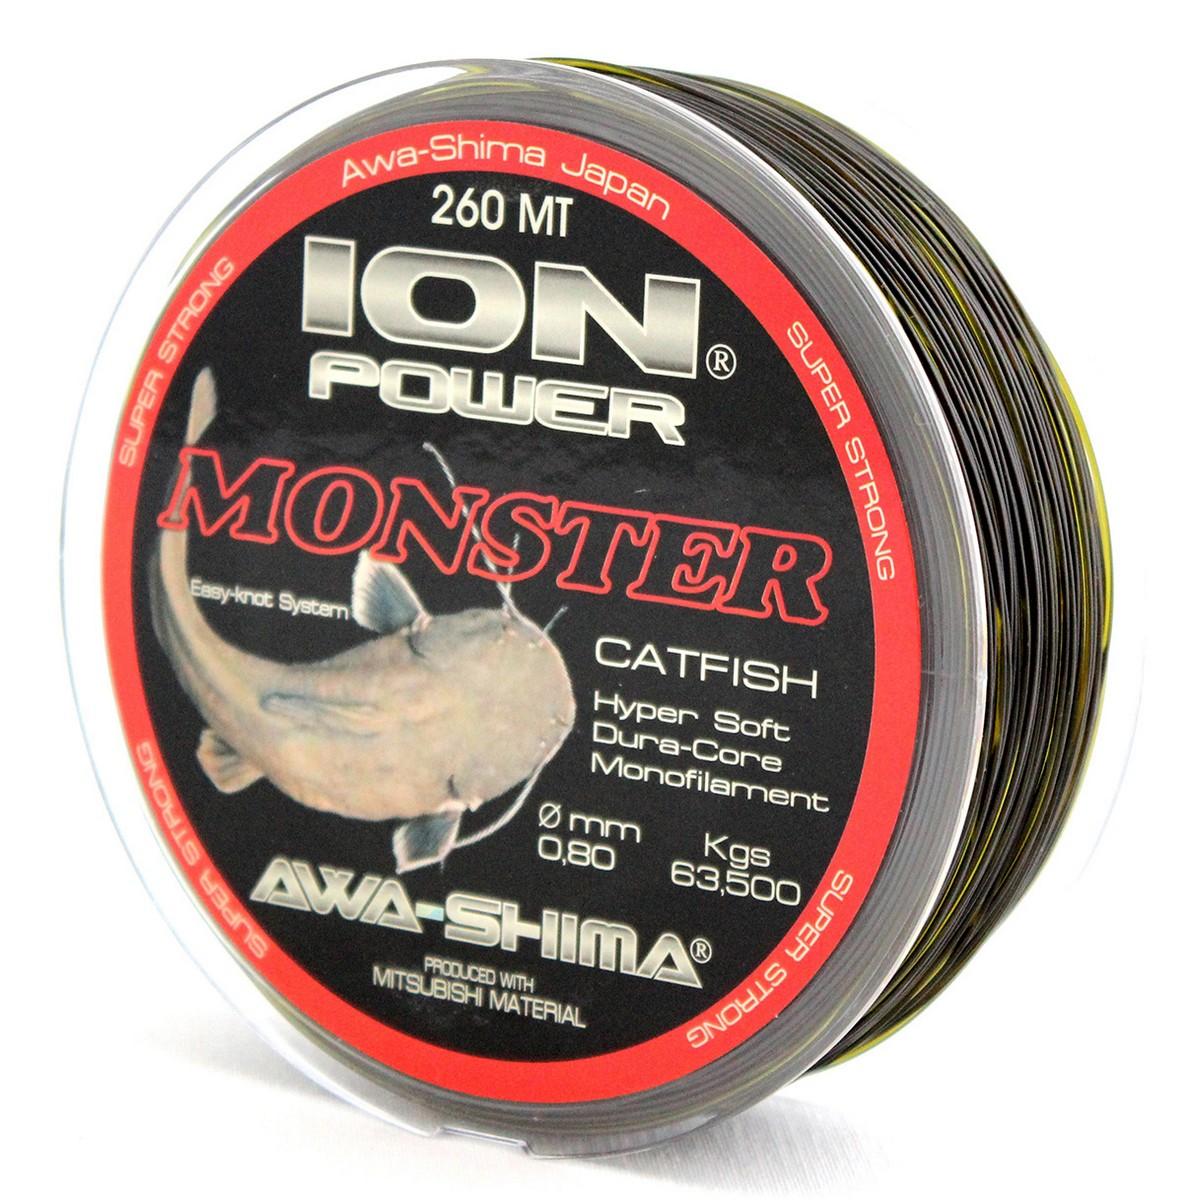 Риболовно влакно Awa-Shima Ion Power Monster 300m